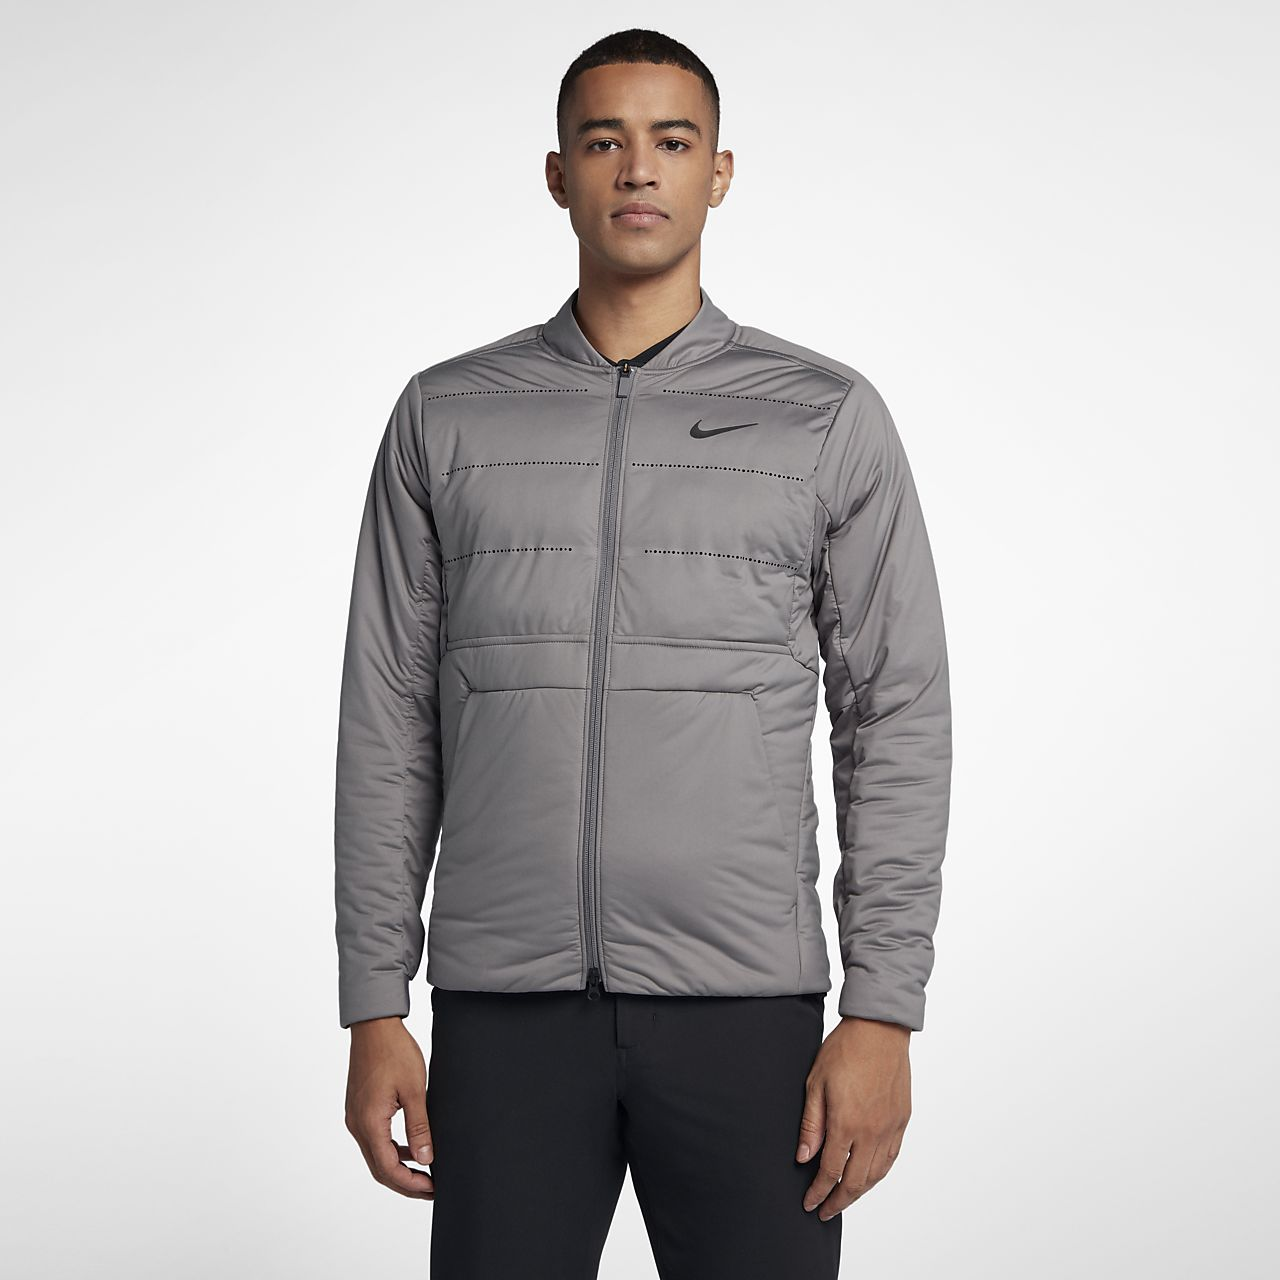 Мужская куртка для гольфа Nike AeroLoft